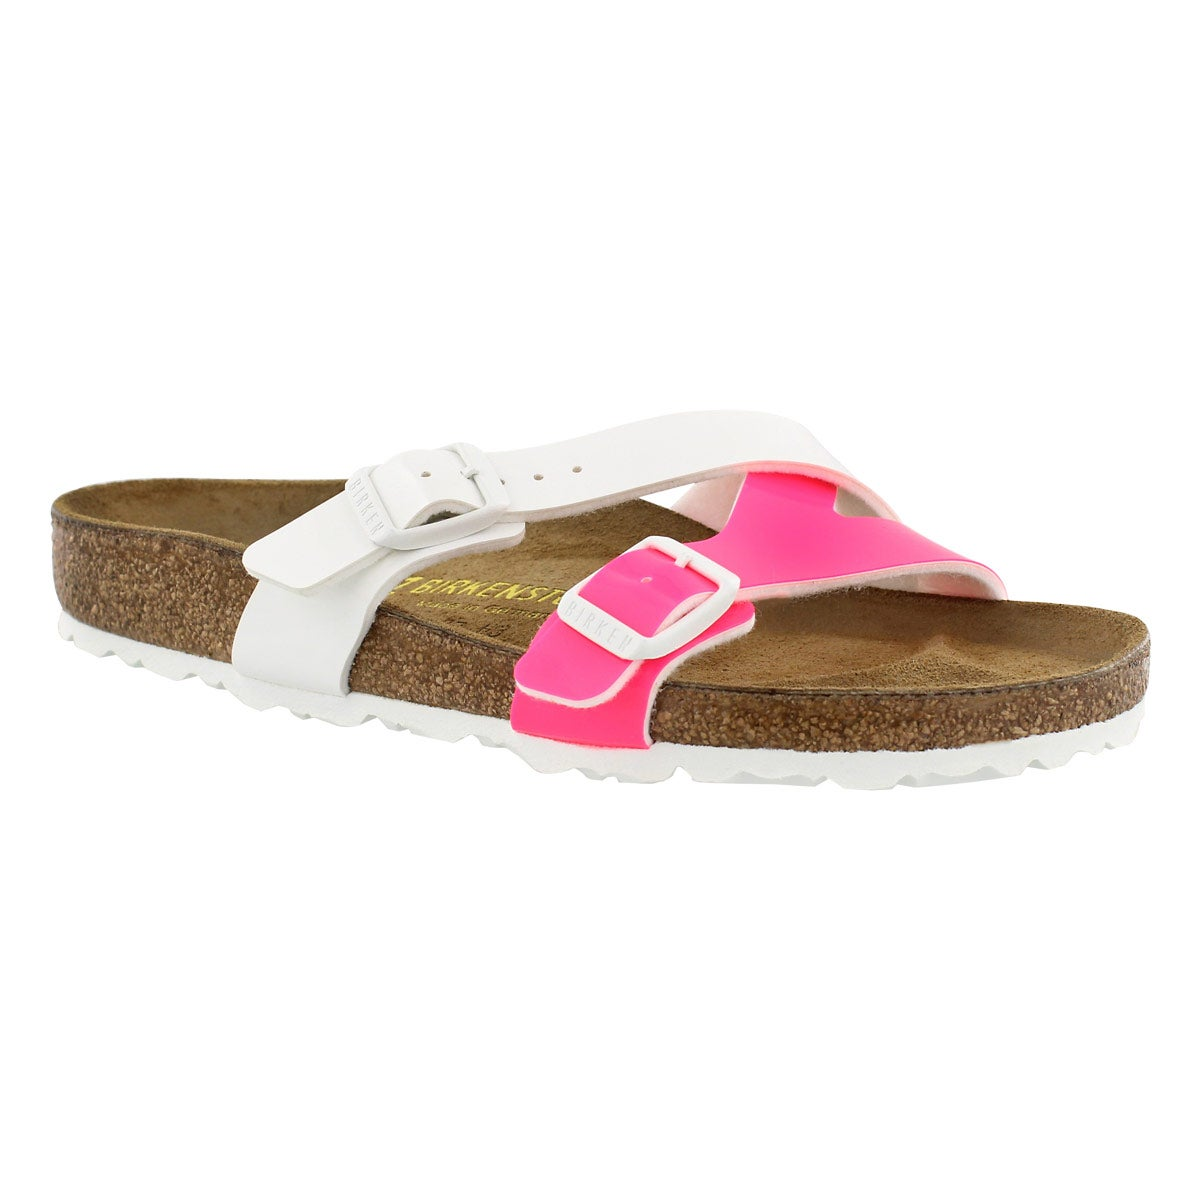 Women's YAO neon pink/white BF sandals